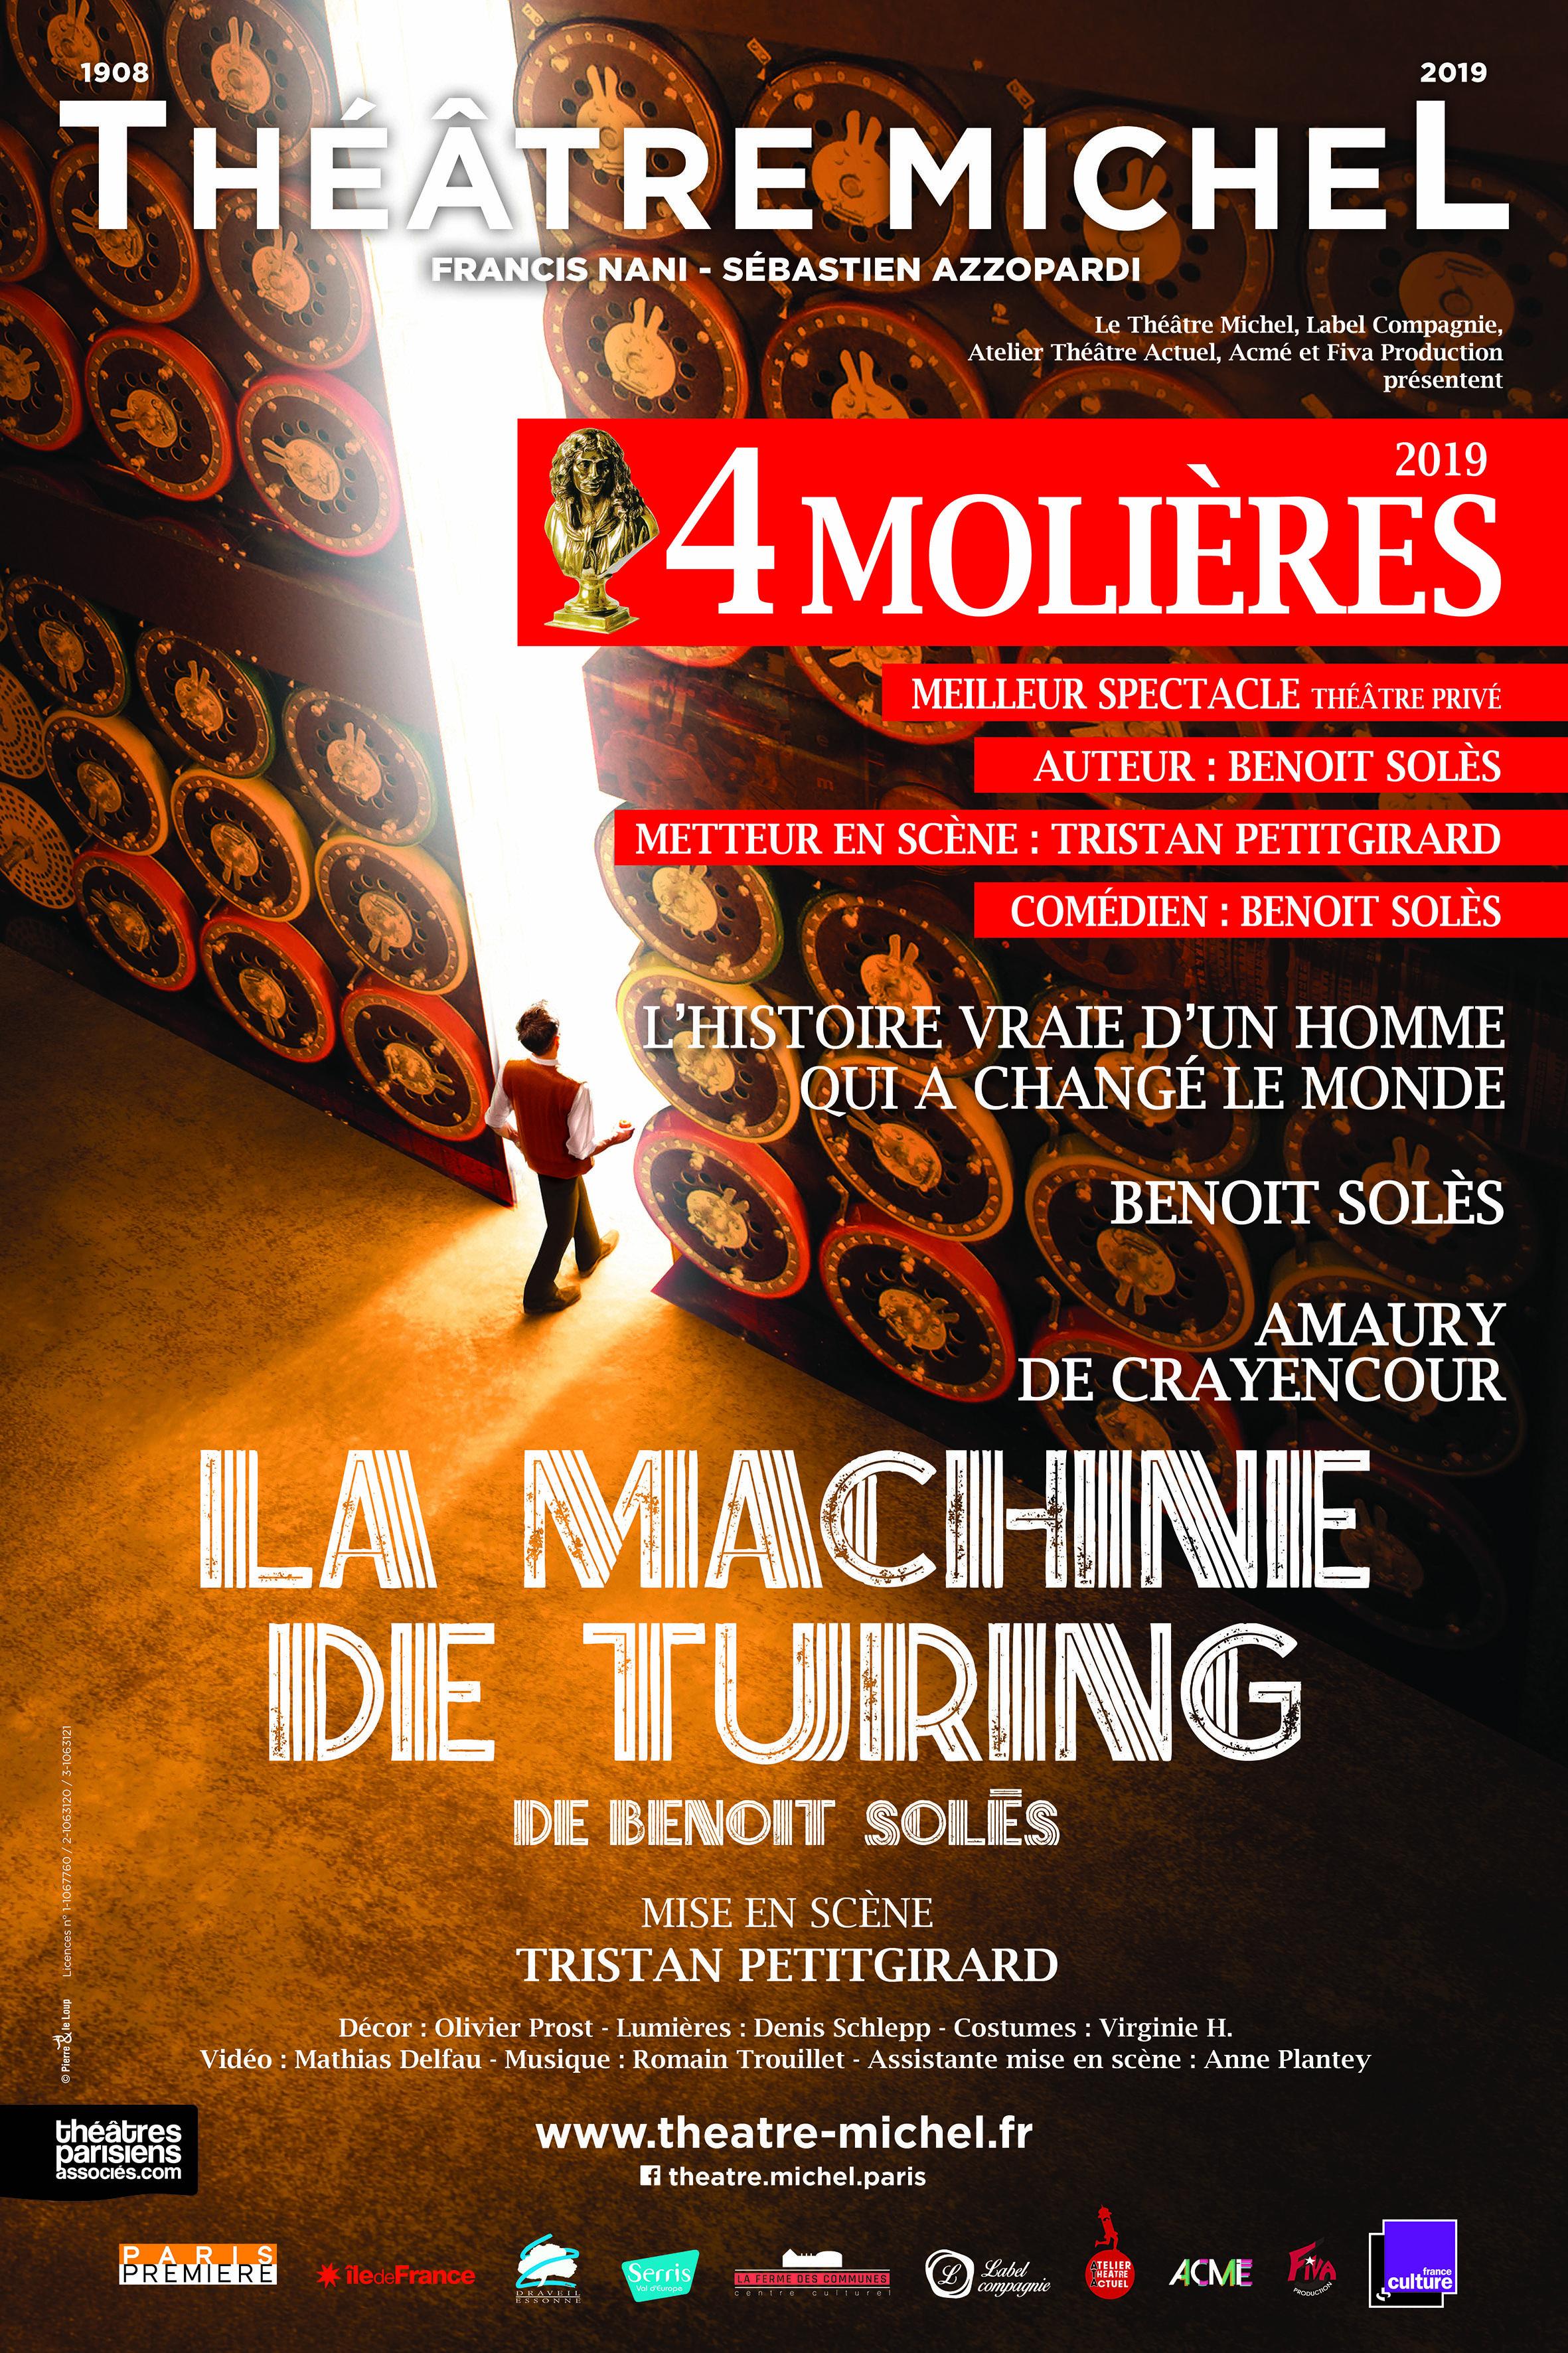 La-Machine-de-Turing-Michel-40x60-MOLIER